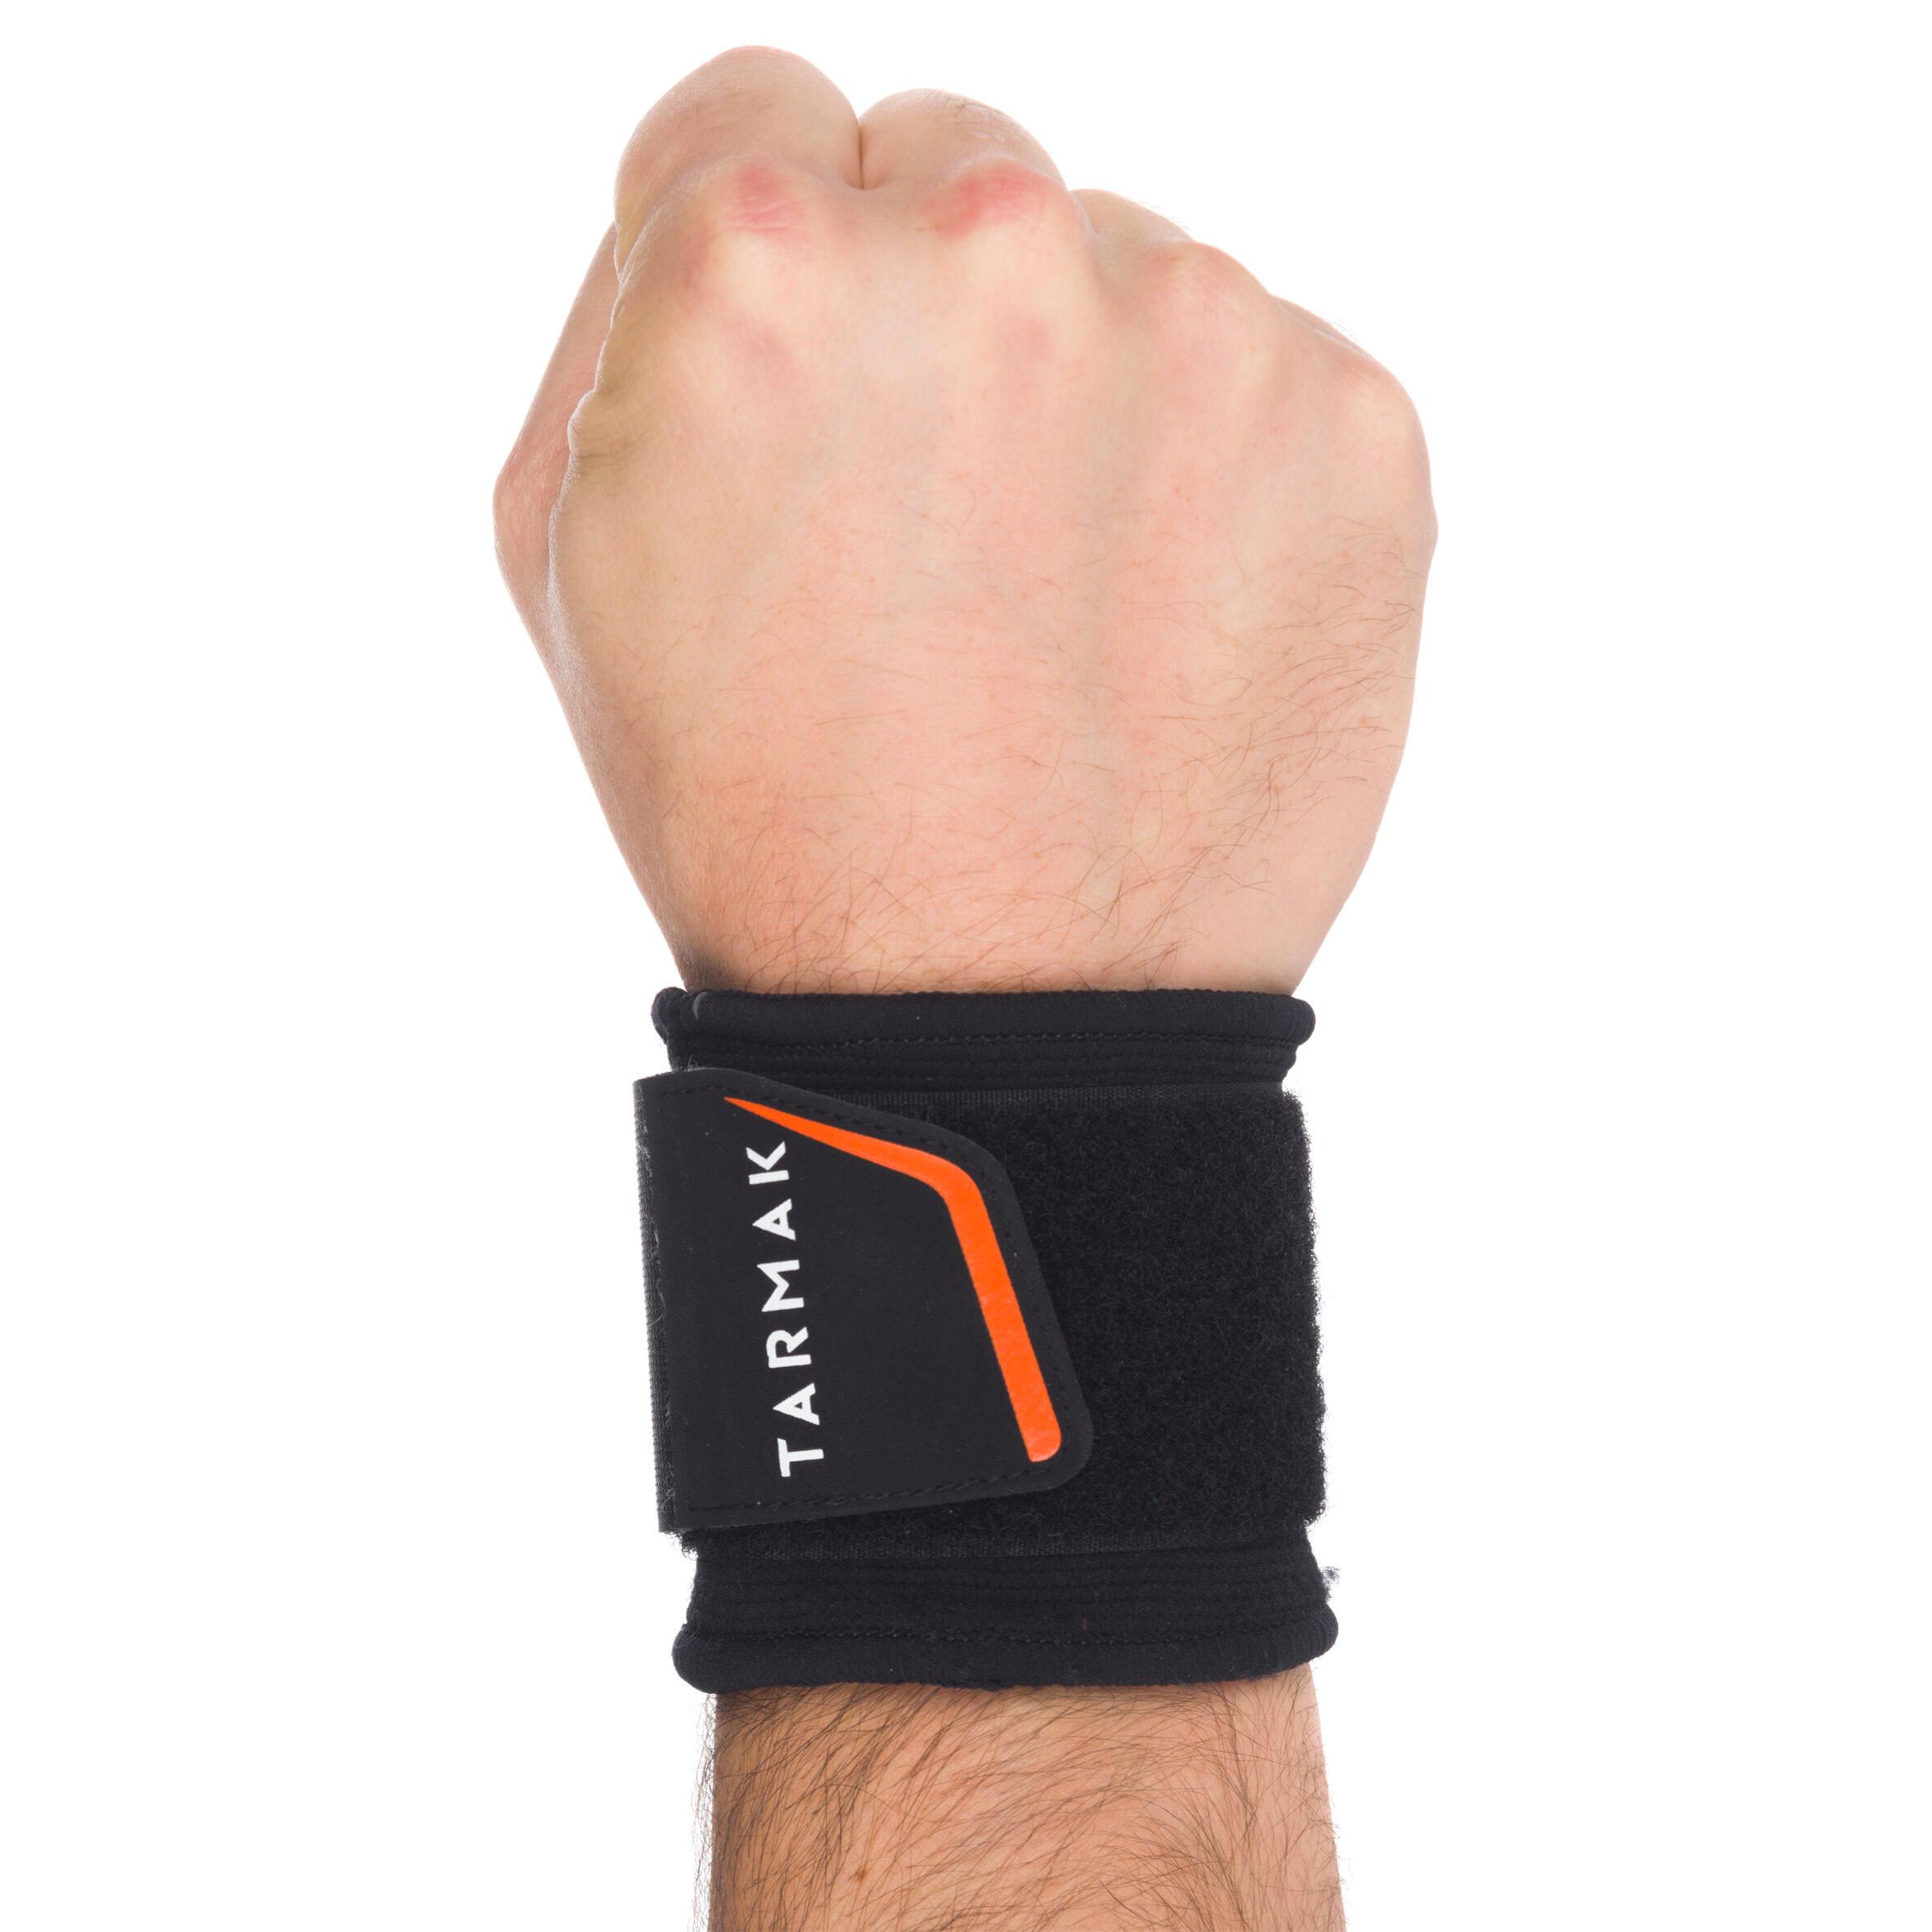 Mid 300 Adult Wrist Strap - Black